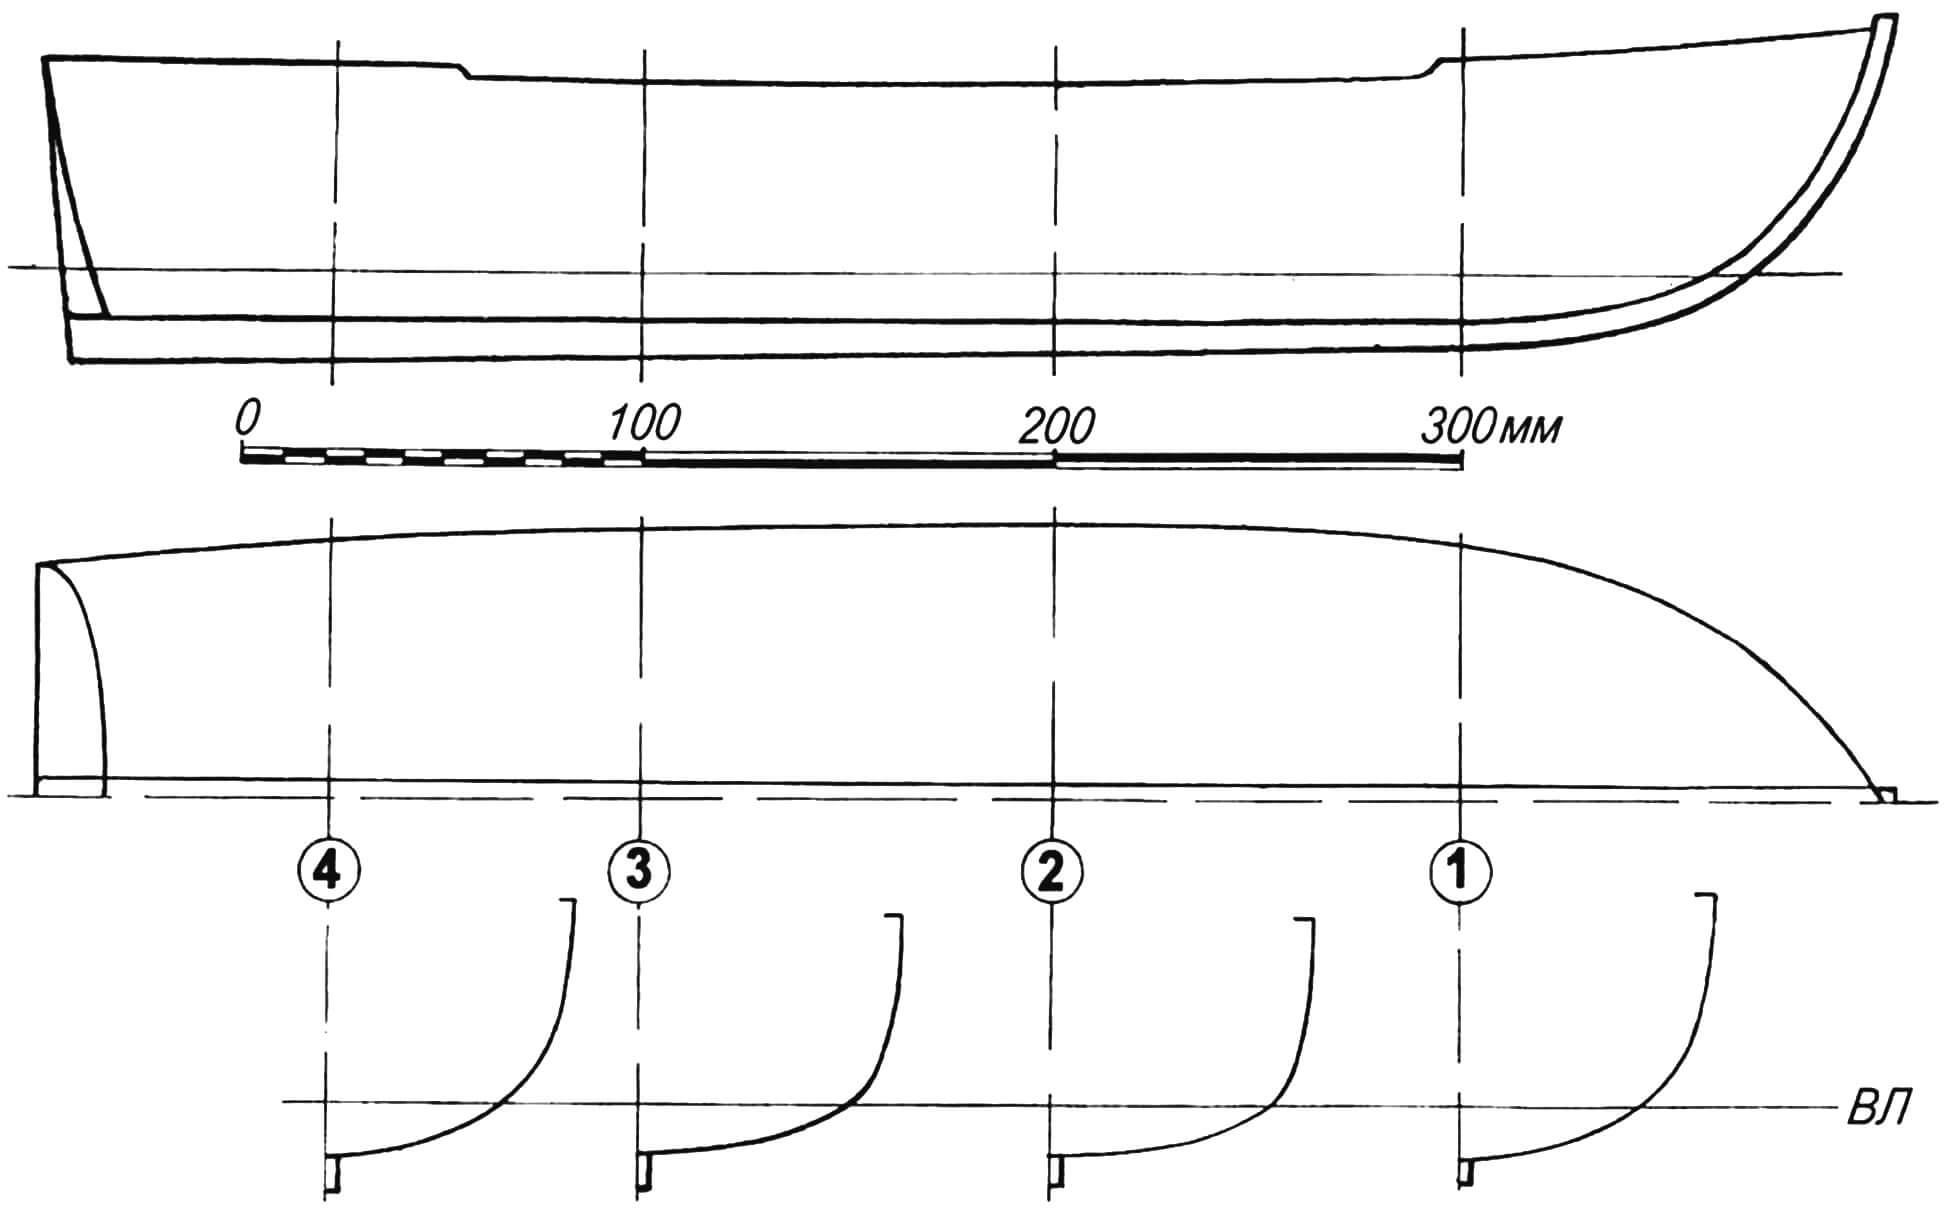 Теоретический чертеж корпуса модели парохода